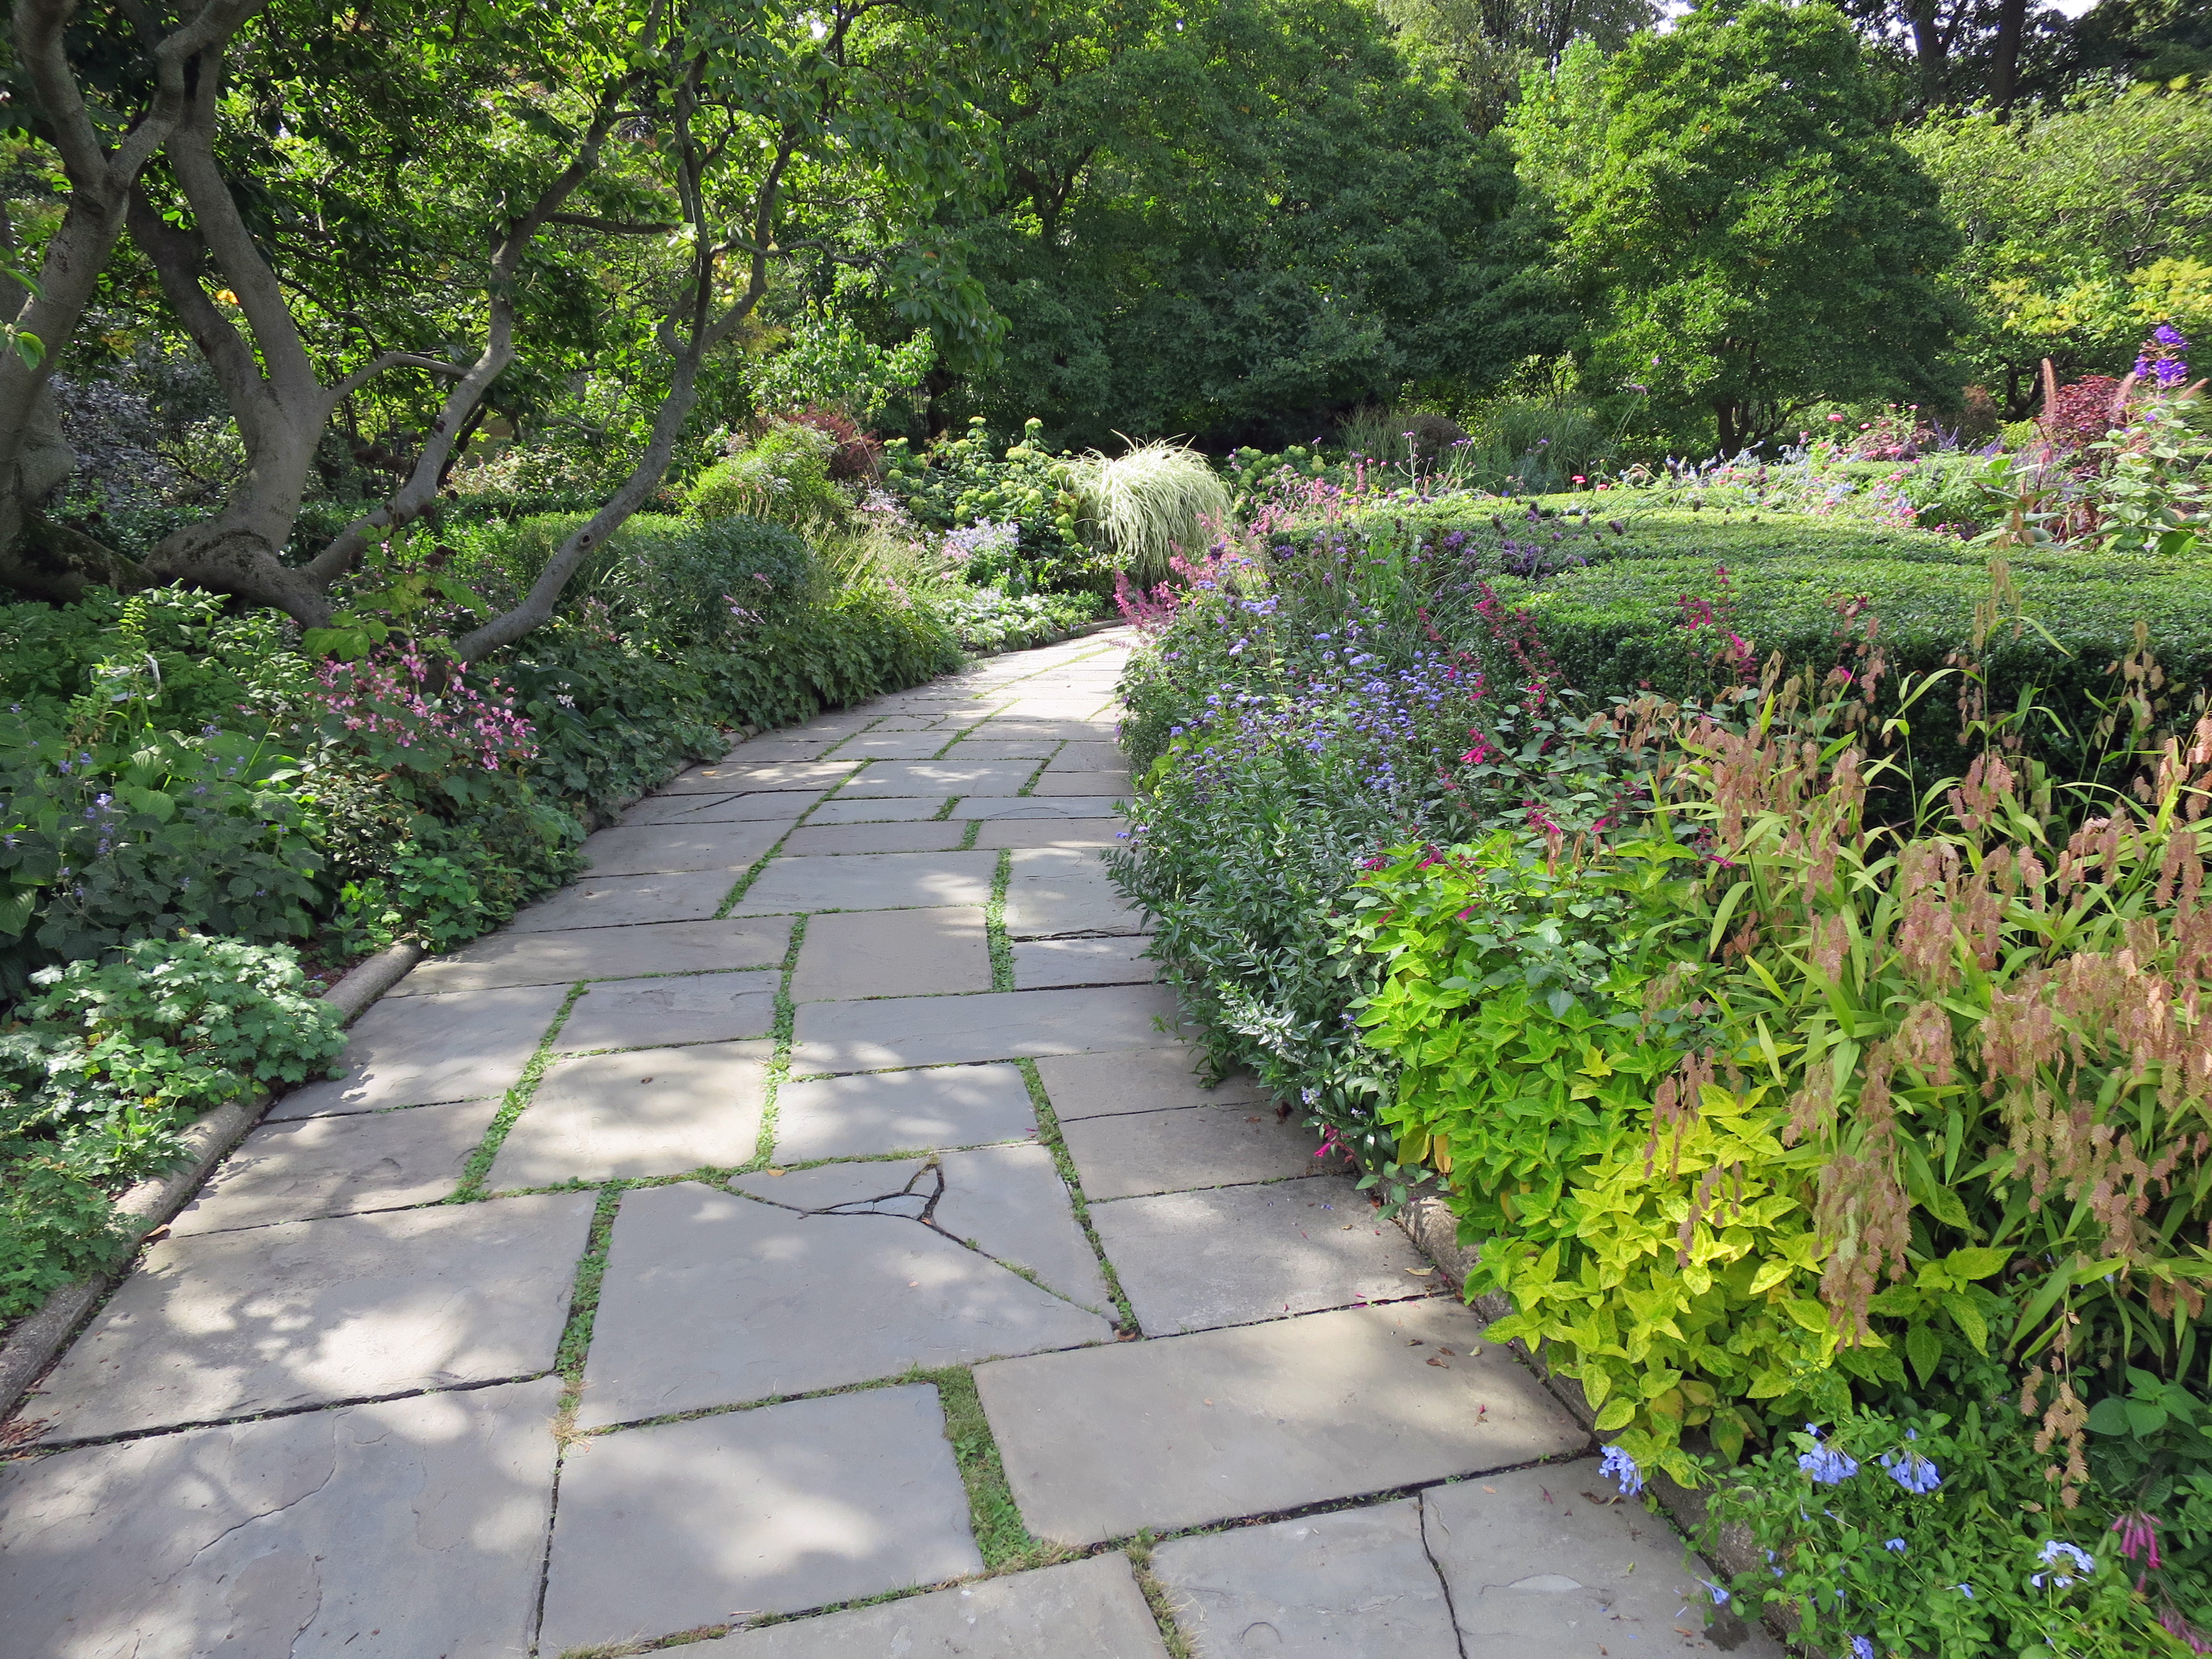 central park conservatory garden september - Central Park Conservatory Garden